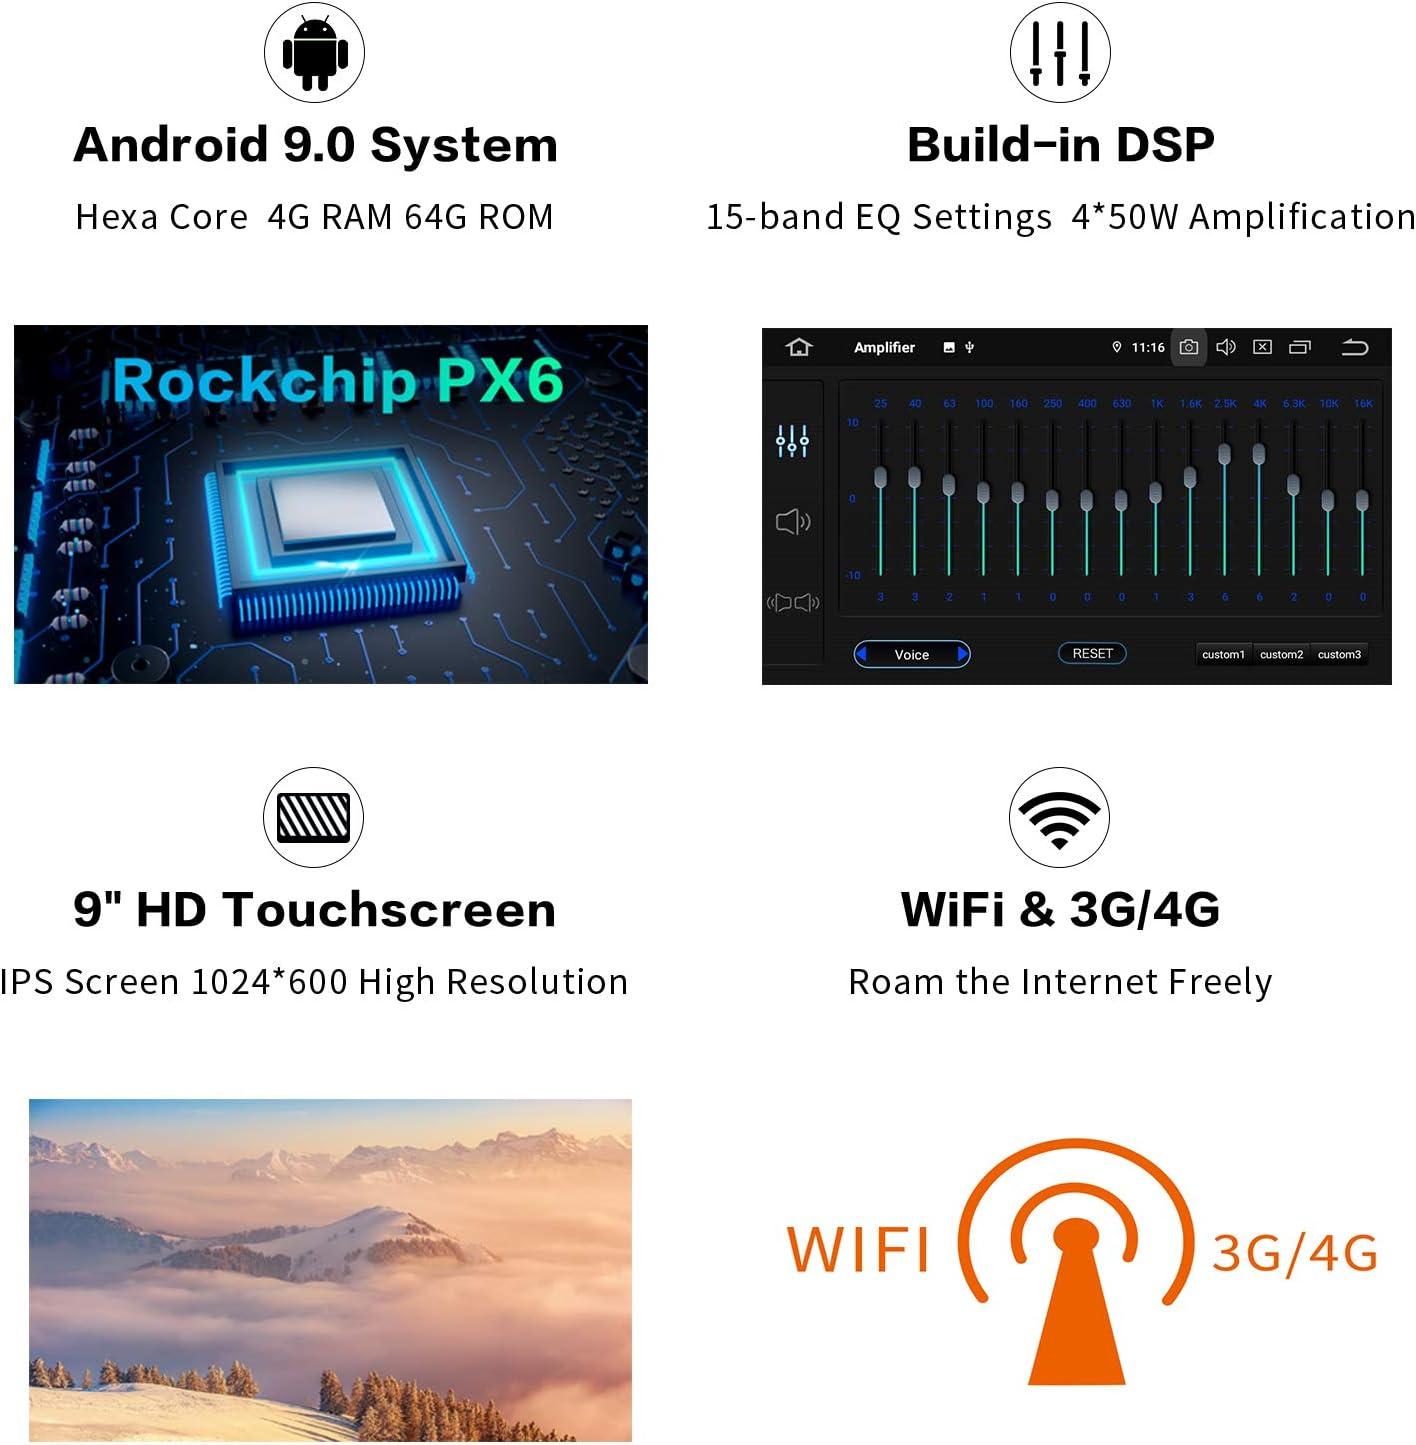 "Dasaita Android 9.0 Car Radio Audio Stereo for Nissan X-Trail Qashqai 2014-2017 Bluetooth GPS Navigation Head Unit Car Vehicle Music Video Player Multimedia 10.2\"" Touchscreen Hexa Core 4G+64G 61fhaIIRa5LSL1500_"